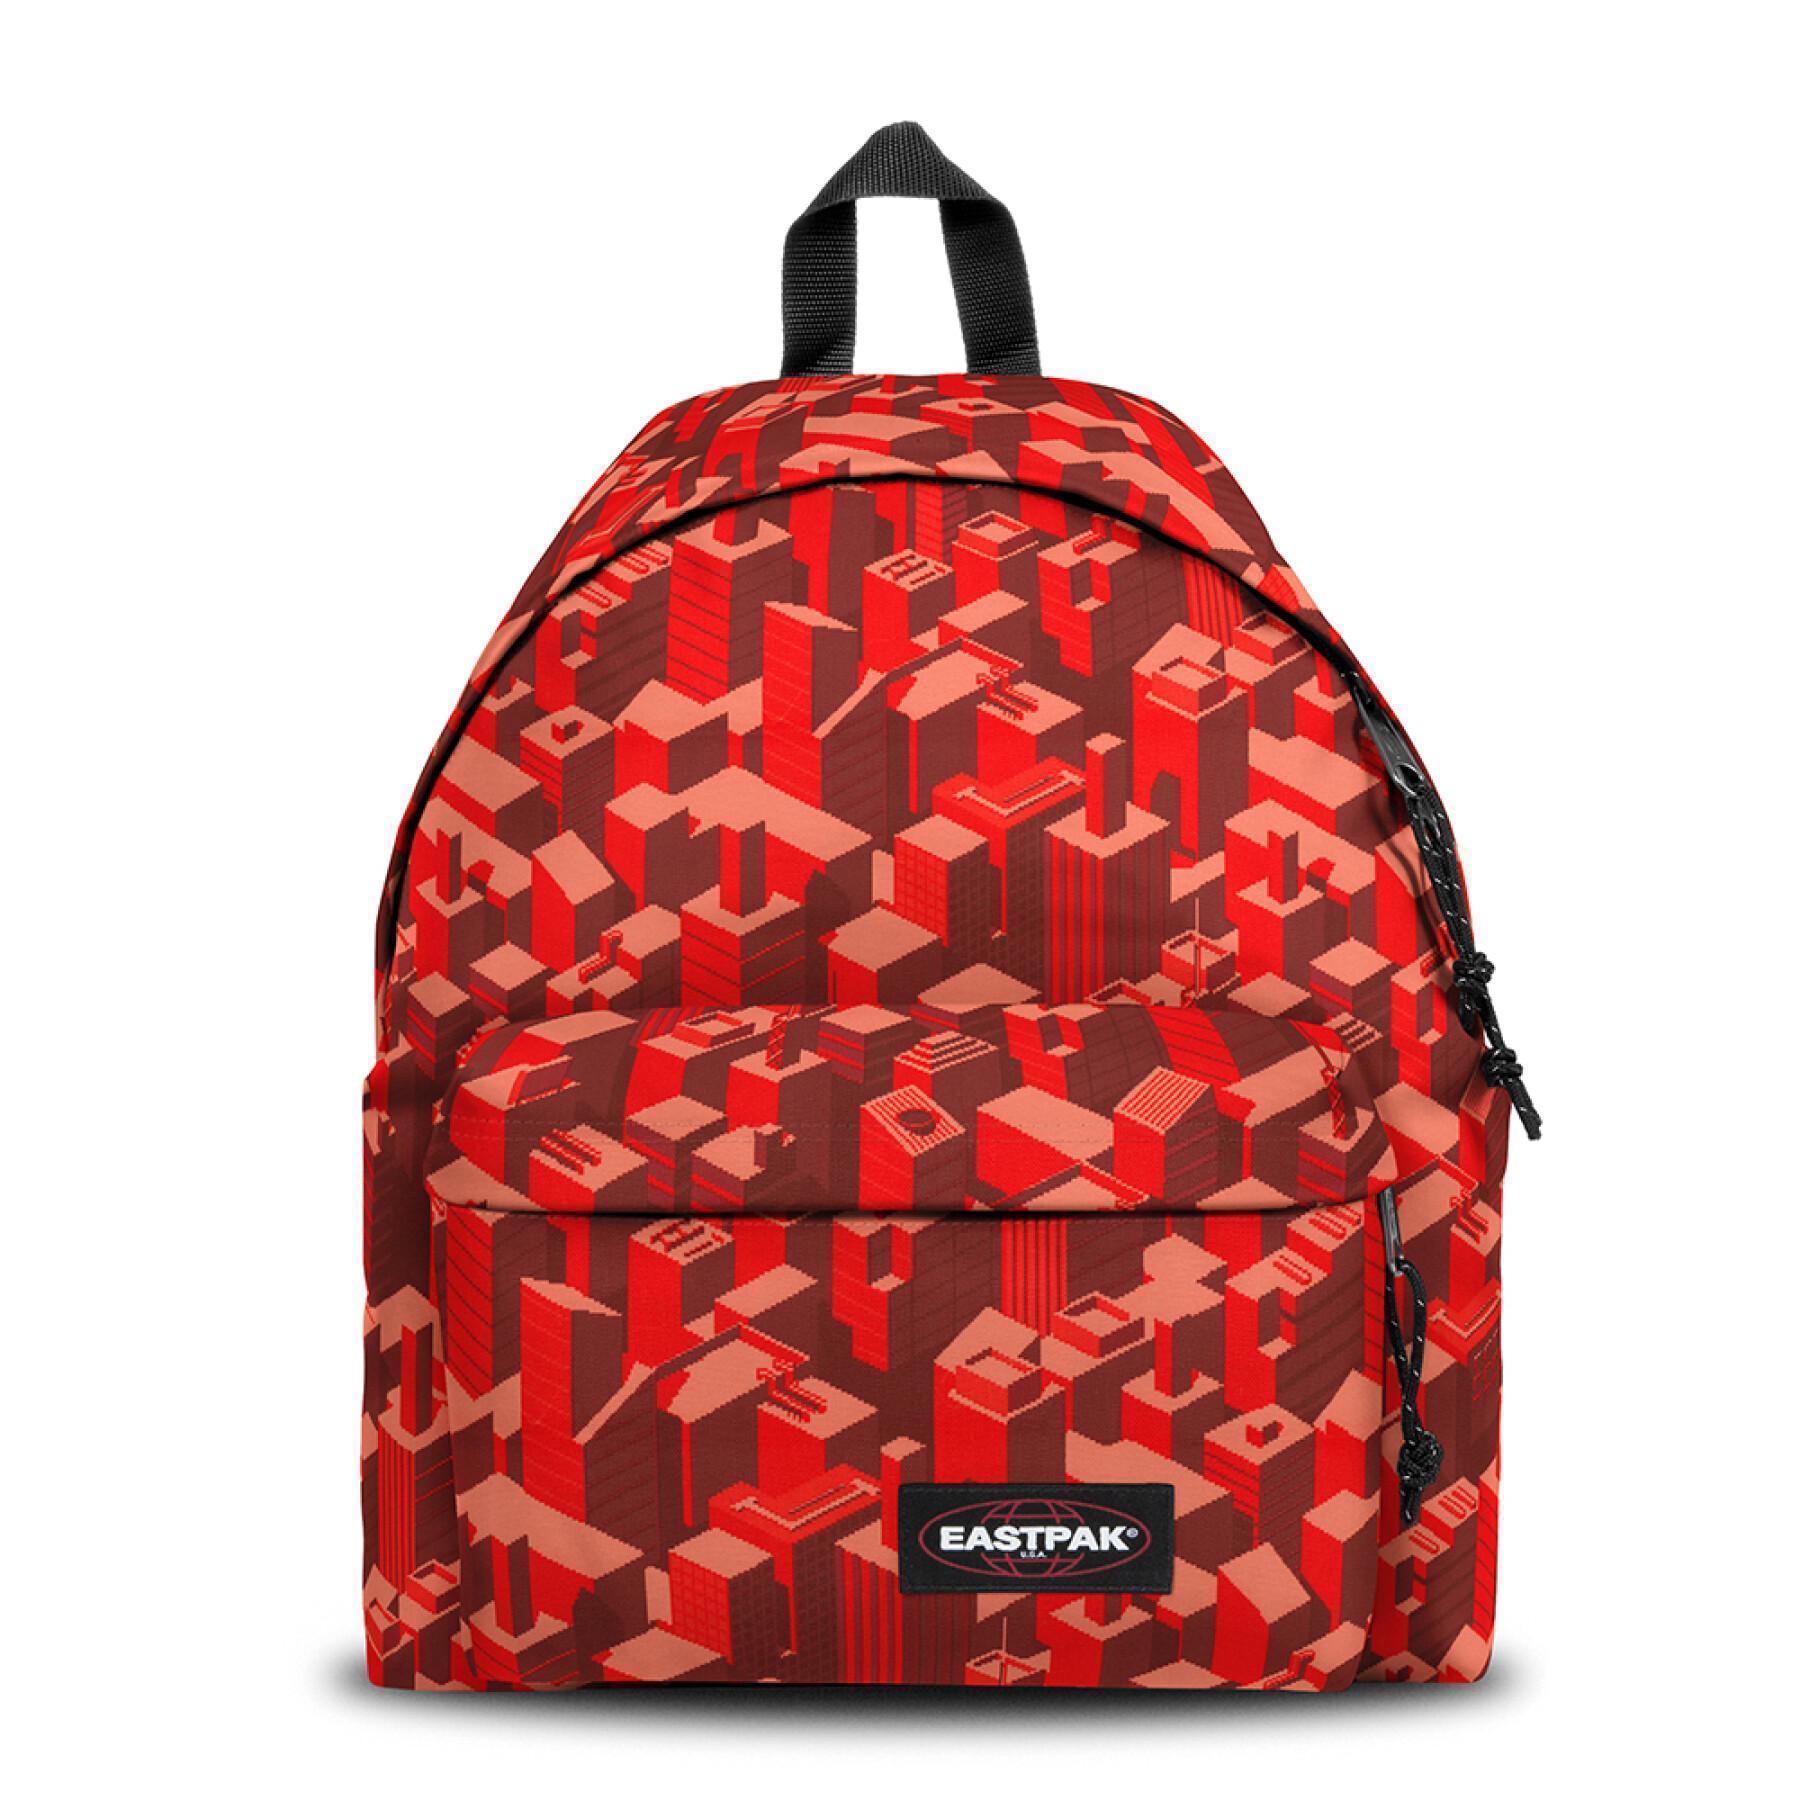 Backpack Eastpak Padded Pak'r Pixel Red